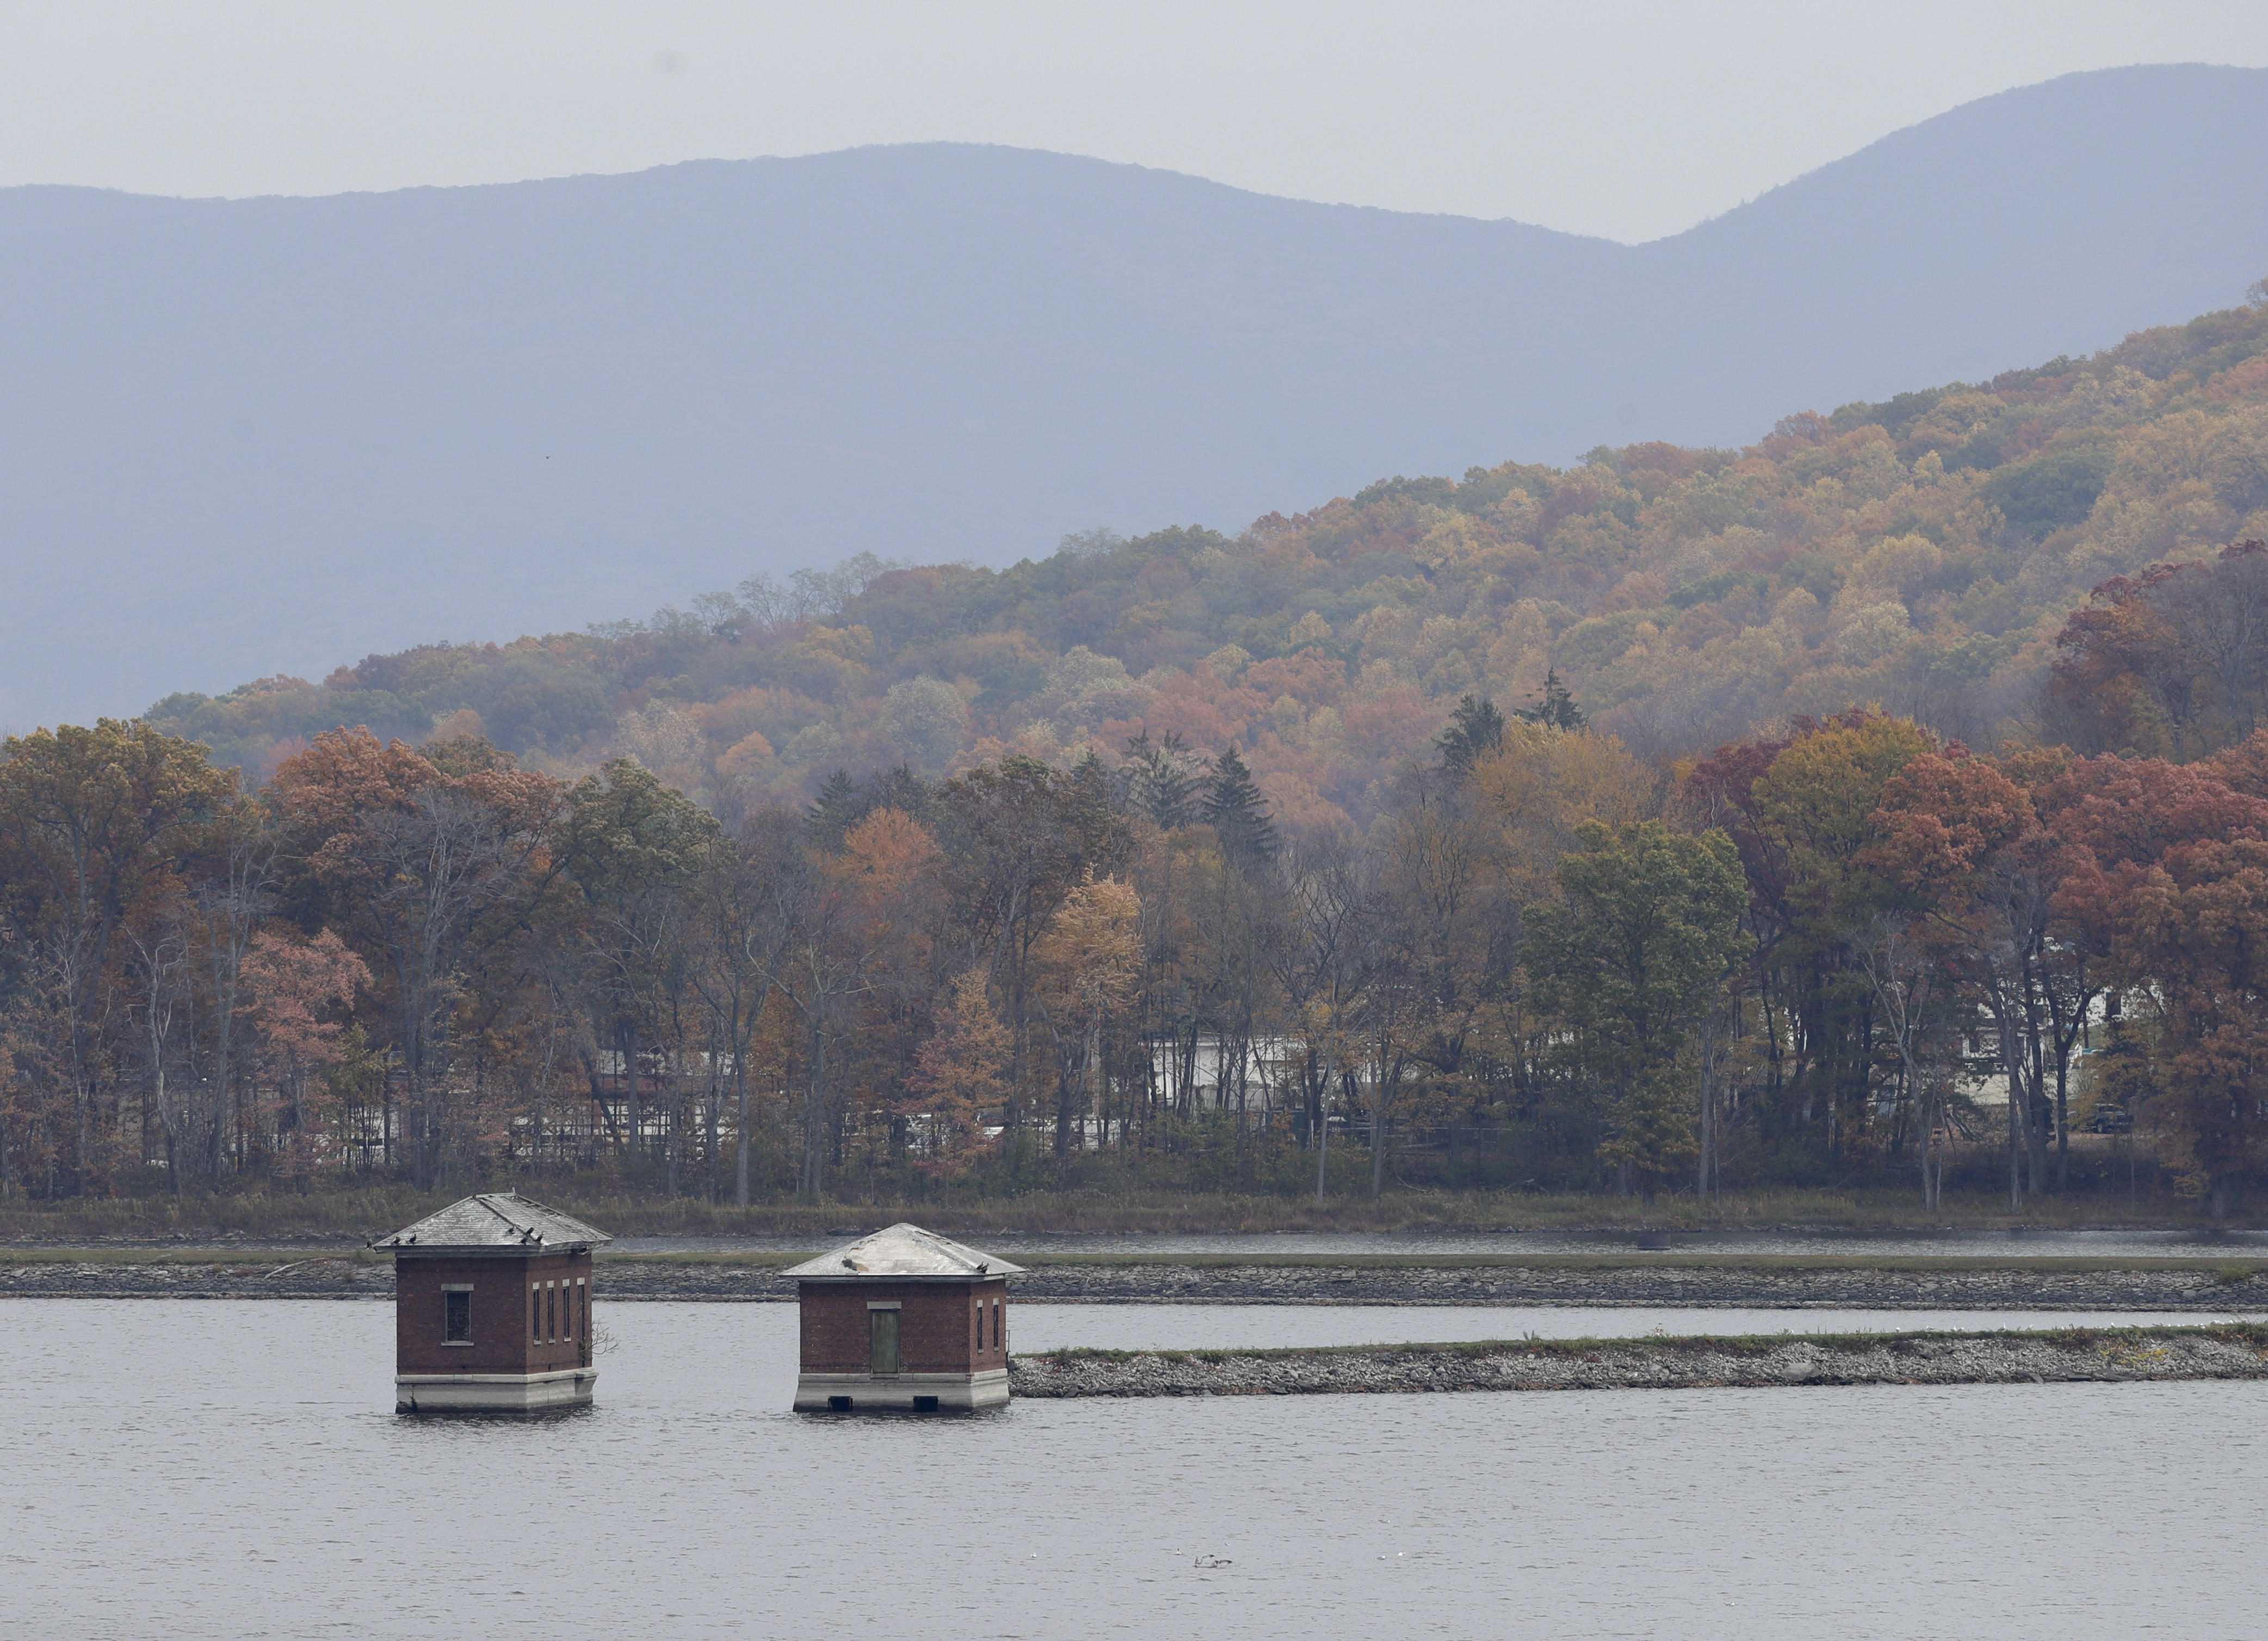 Water contamination scare hits Newburgh, New York - CBS News